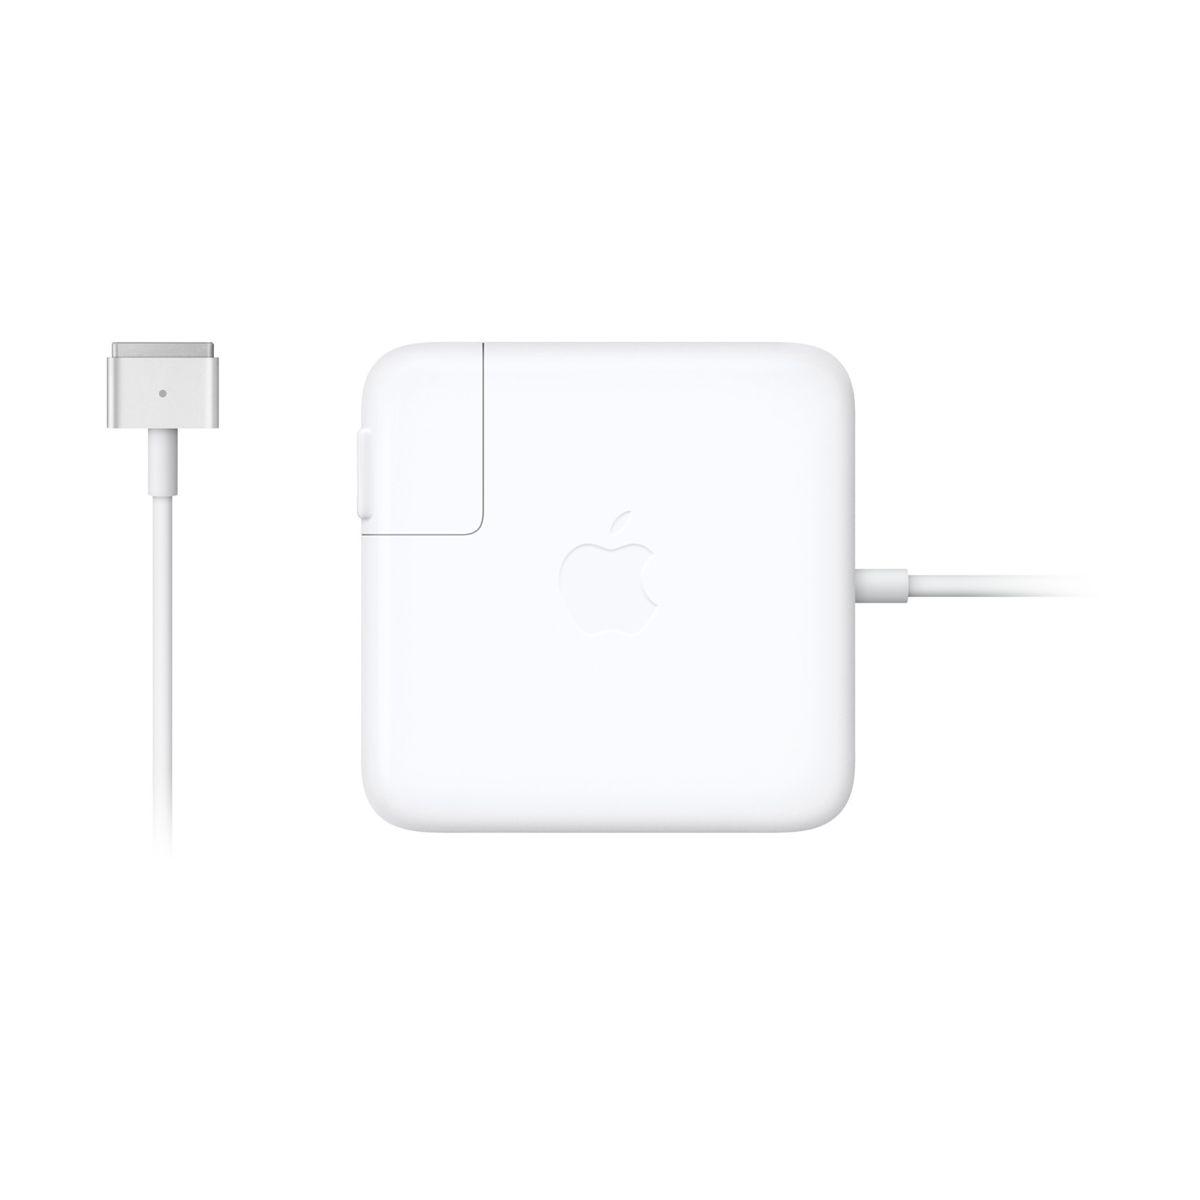 Alim apple magsafe 2 60w mbp 13 retina (photo)